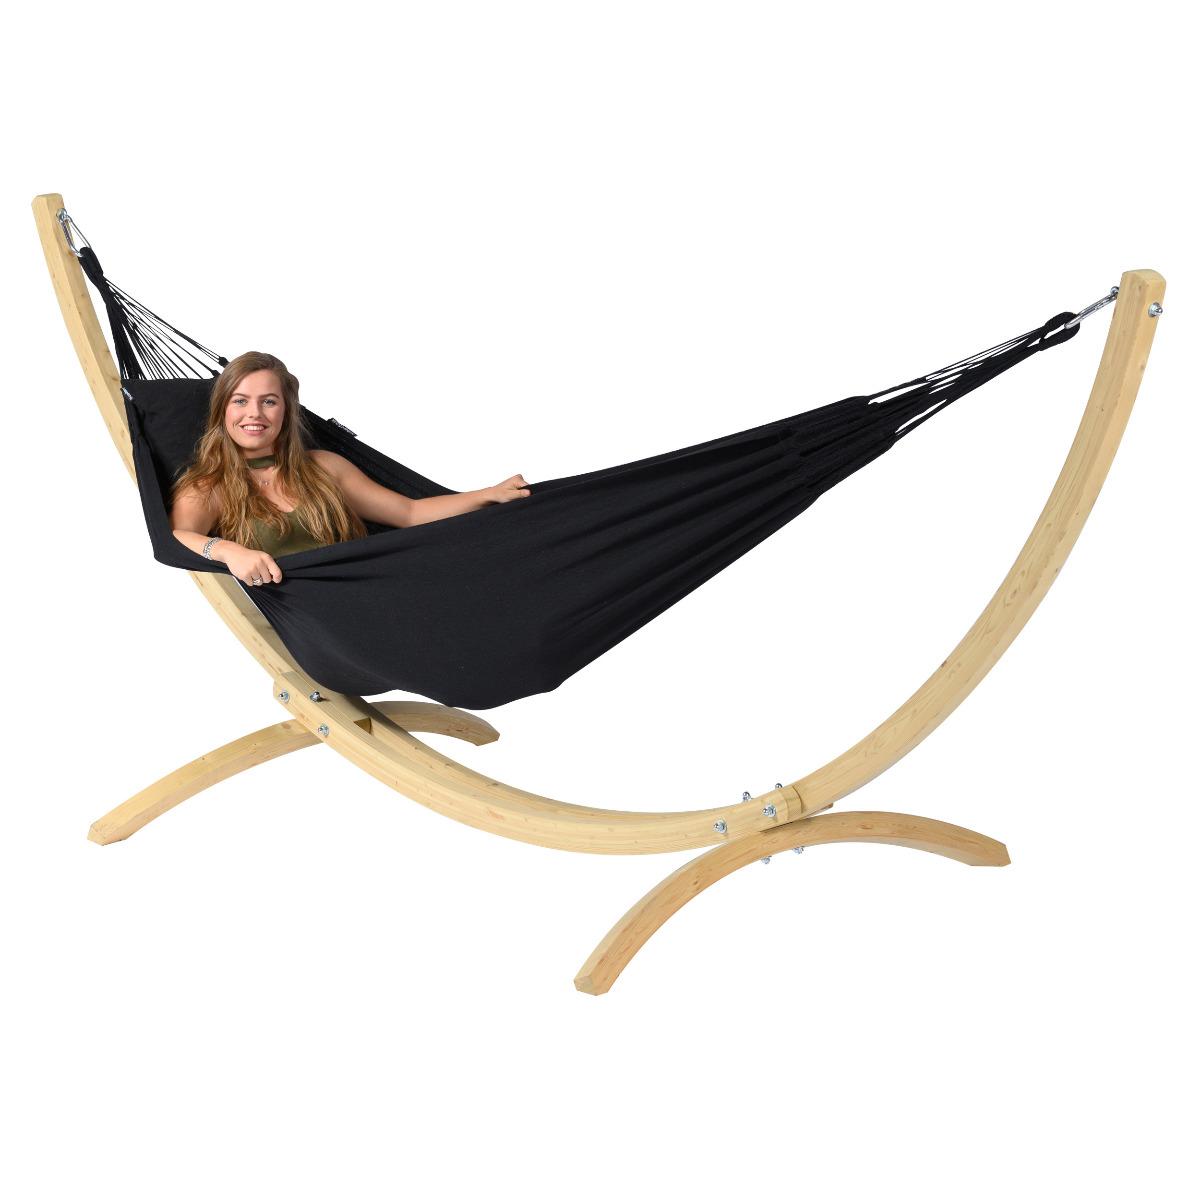 'Wood & Classic' Black E�npersoons Hangmatset - Zwart - Tropilex �